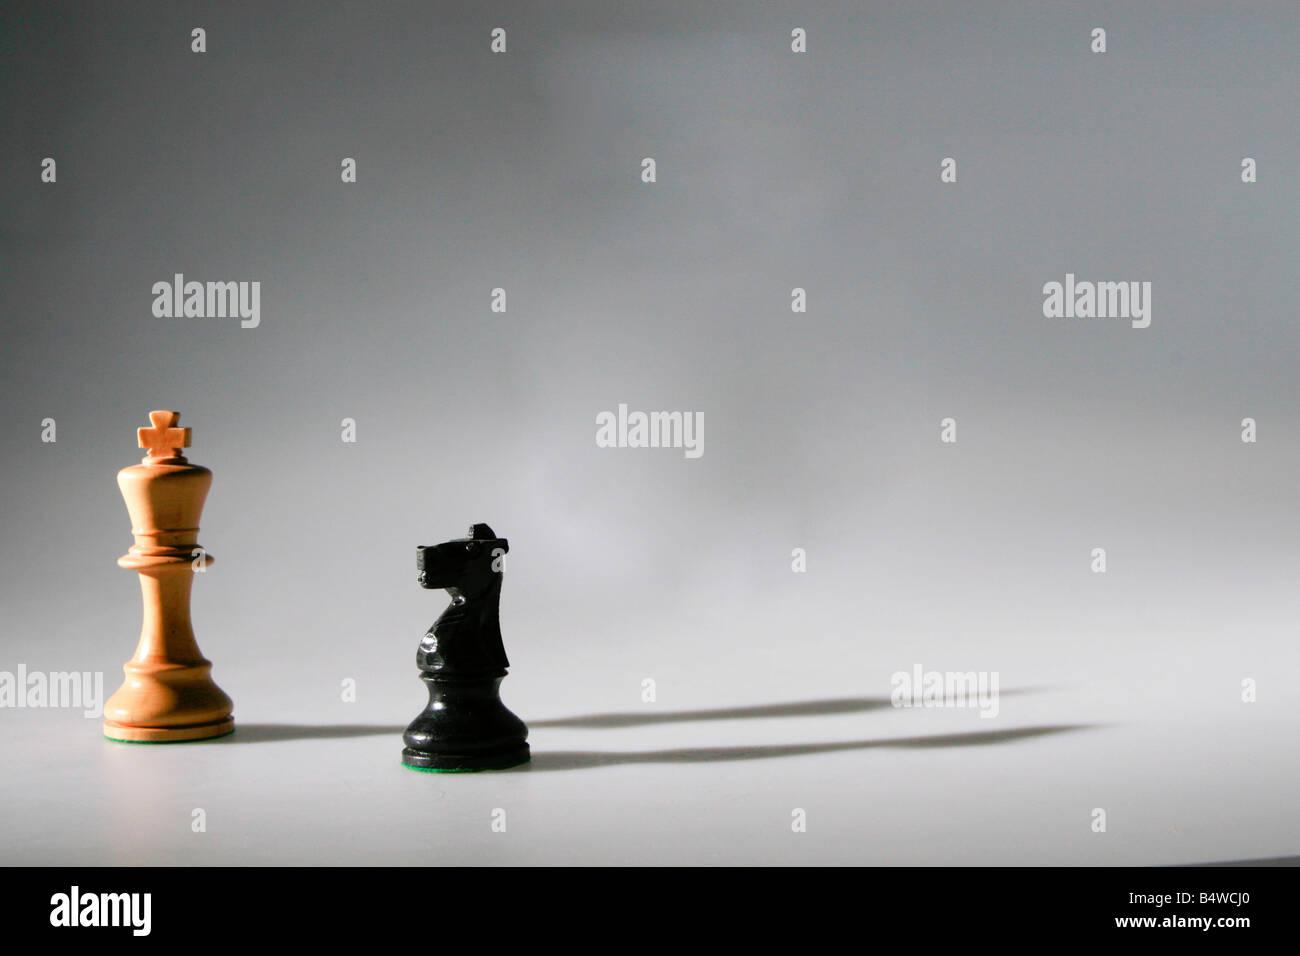 chess figures - Stock Image